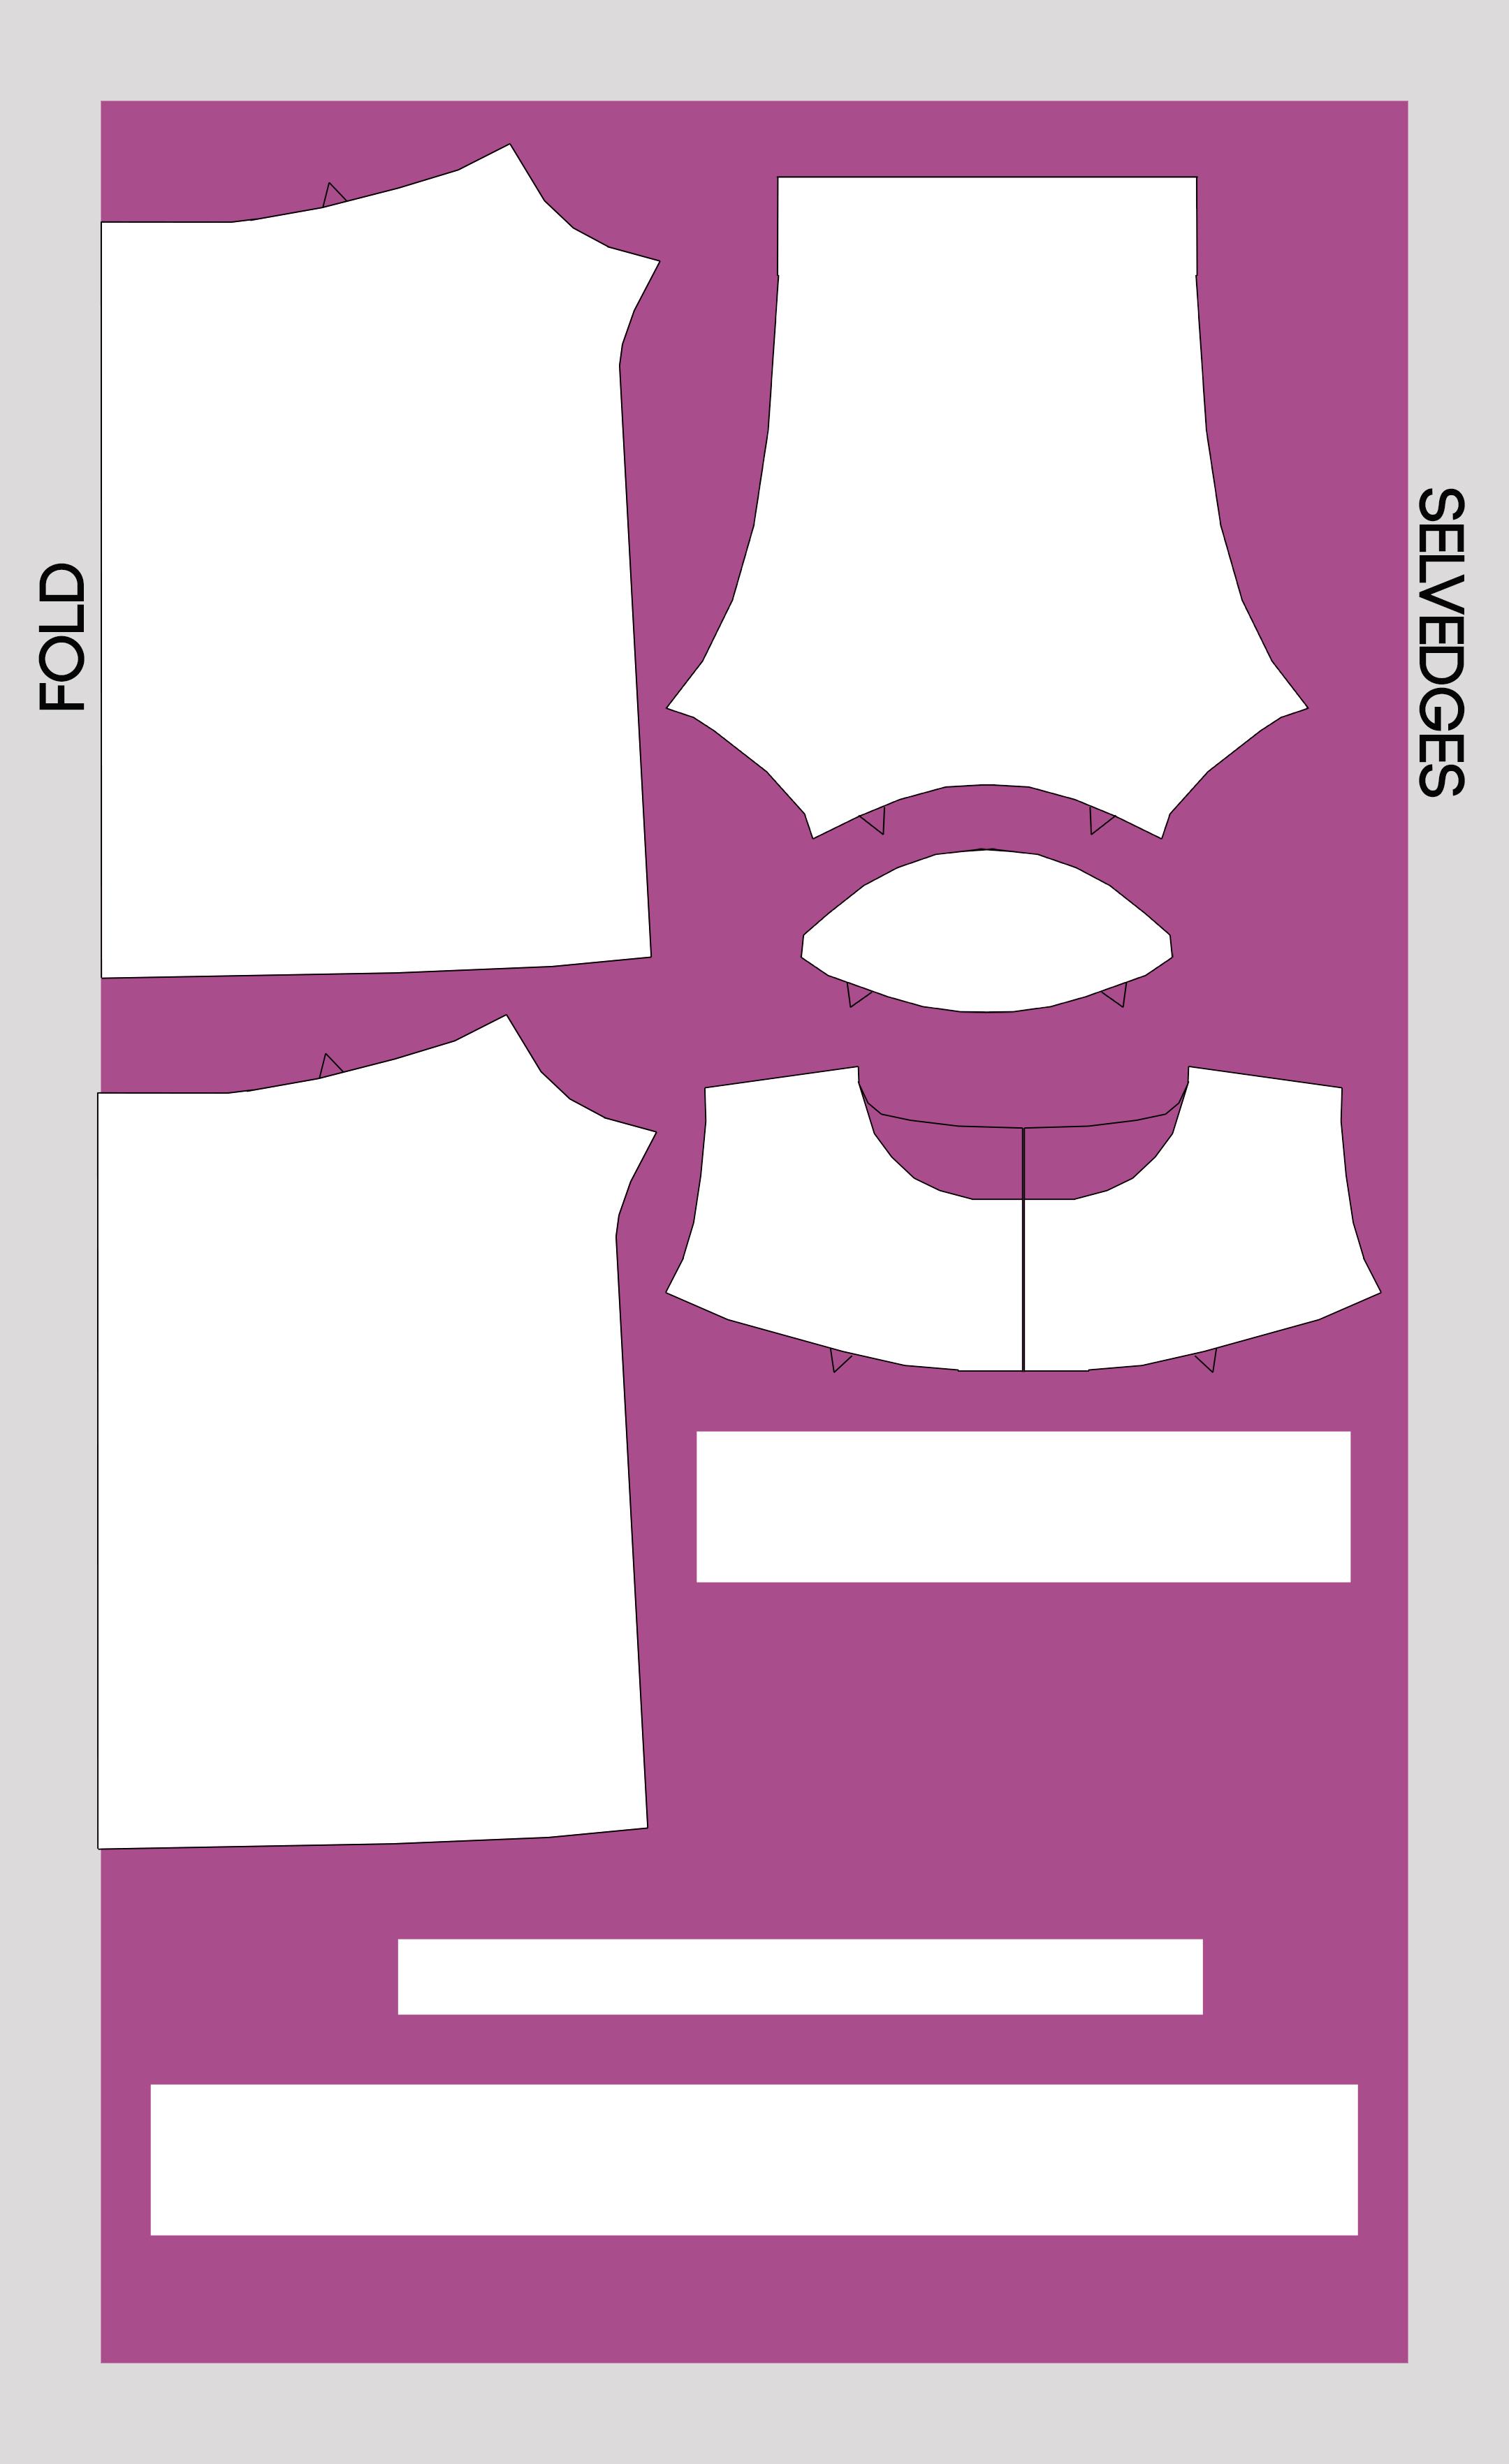 Pattern piece cutting diagram